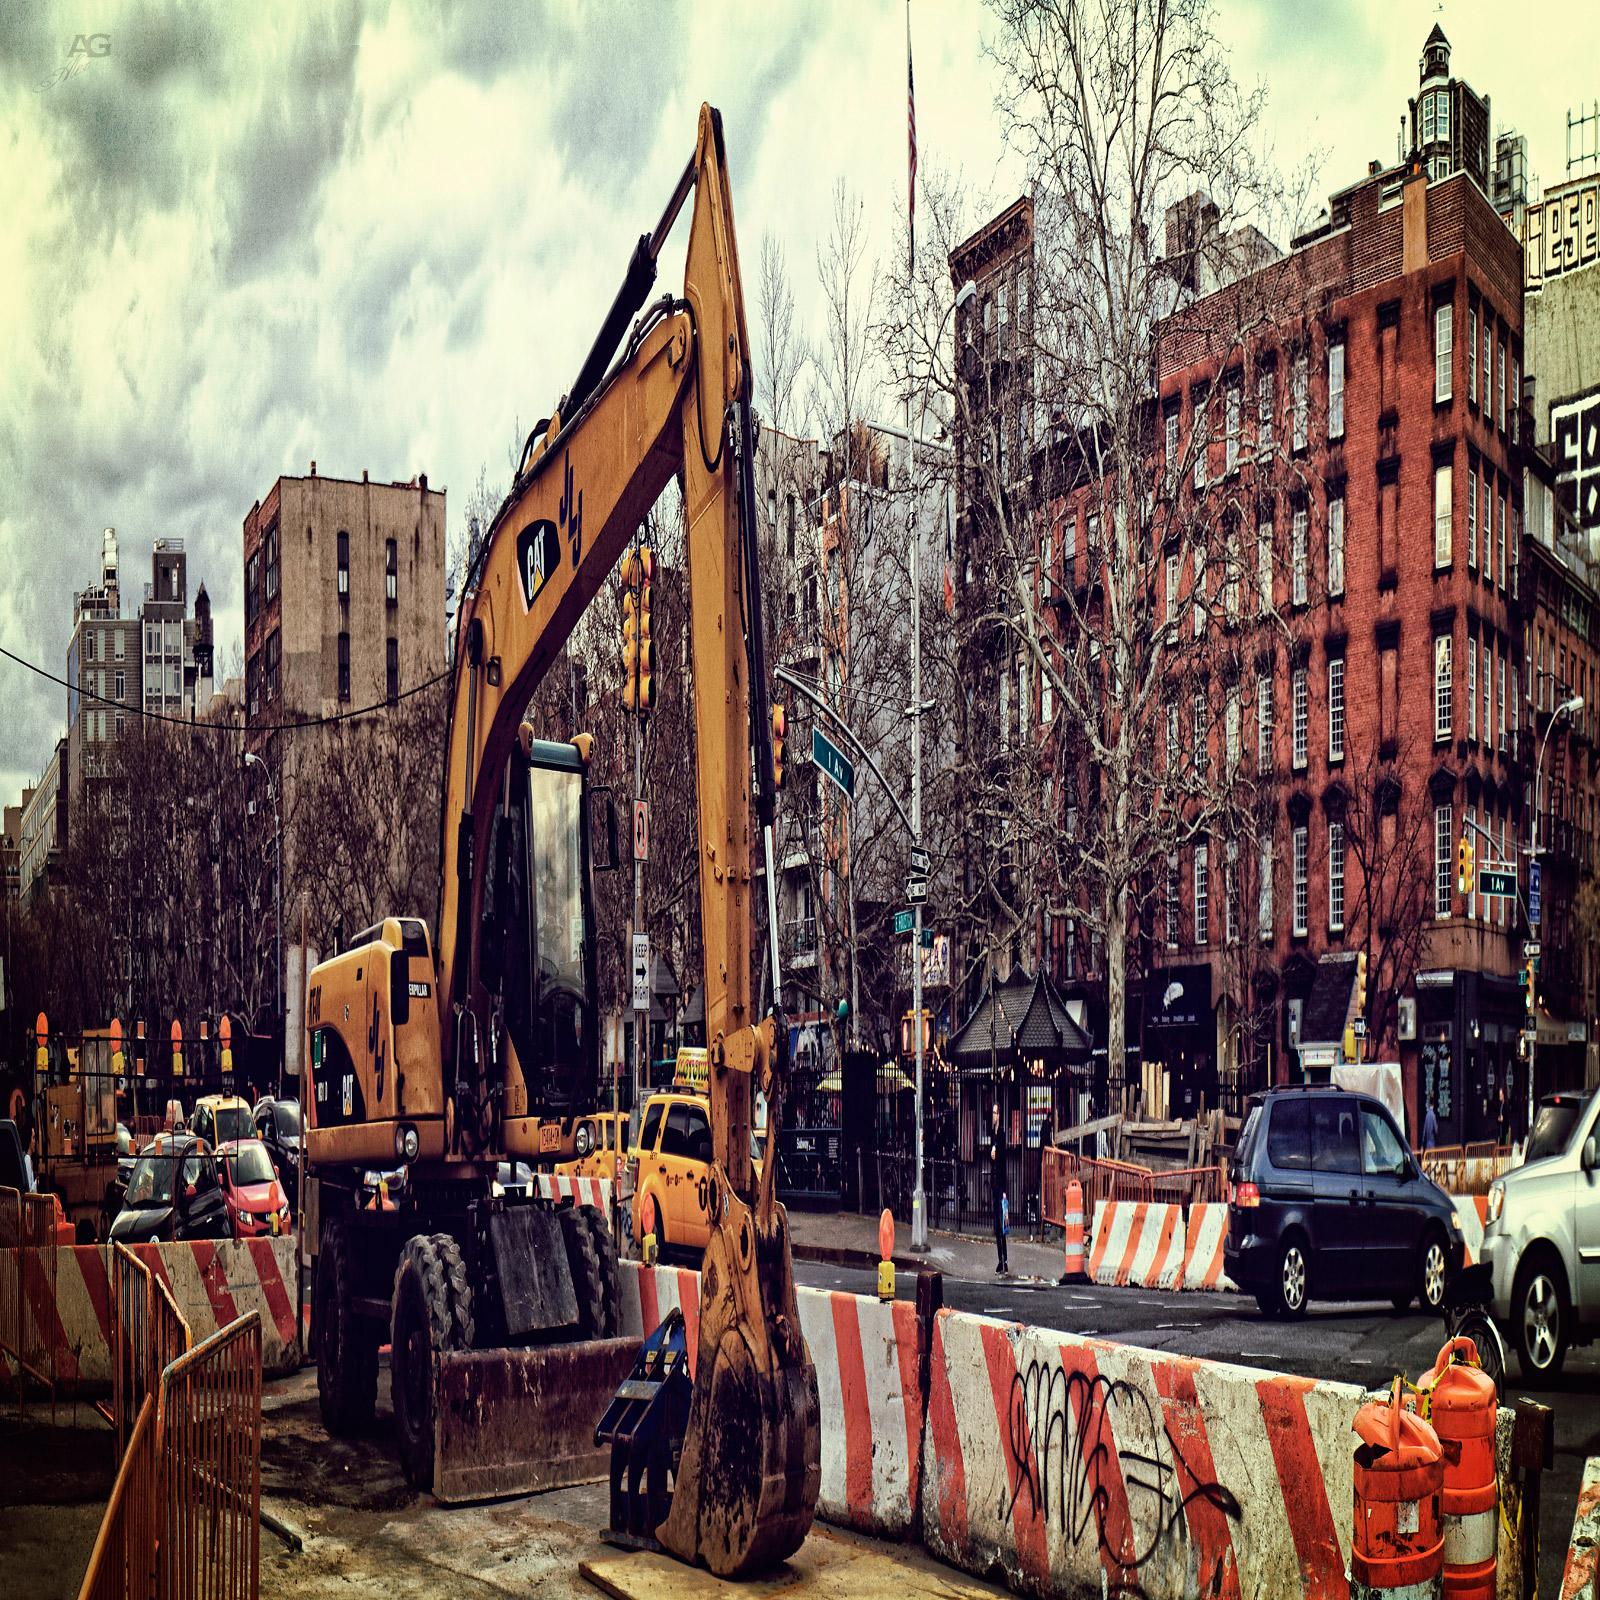 ExcavatorOnManhatanStreetVillage_squished_1600